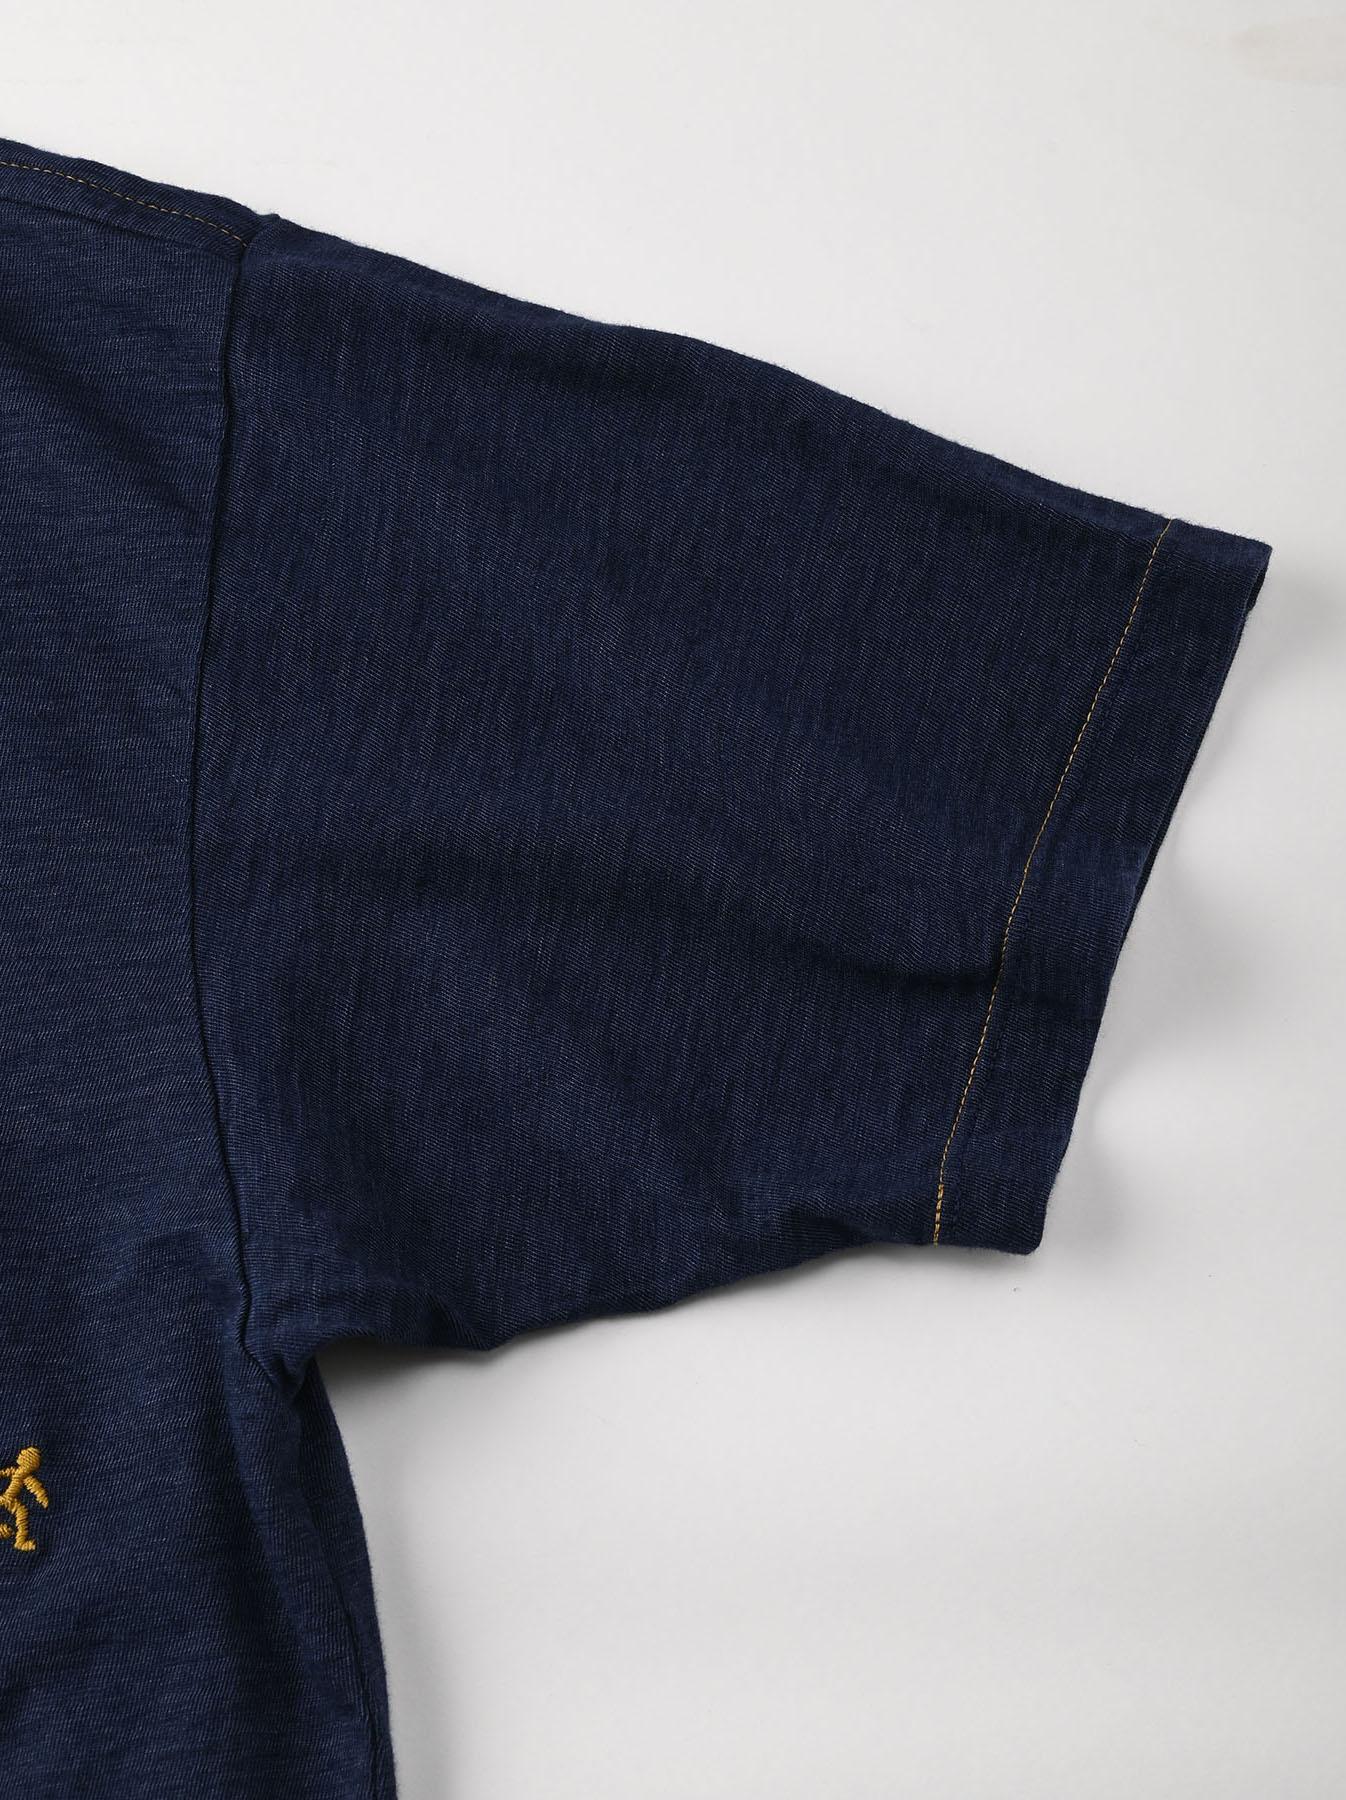 Indigo Hayama-kun Embroidered 908 Ocean T-shirt (0621)-9